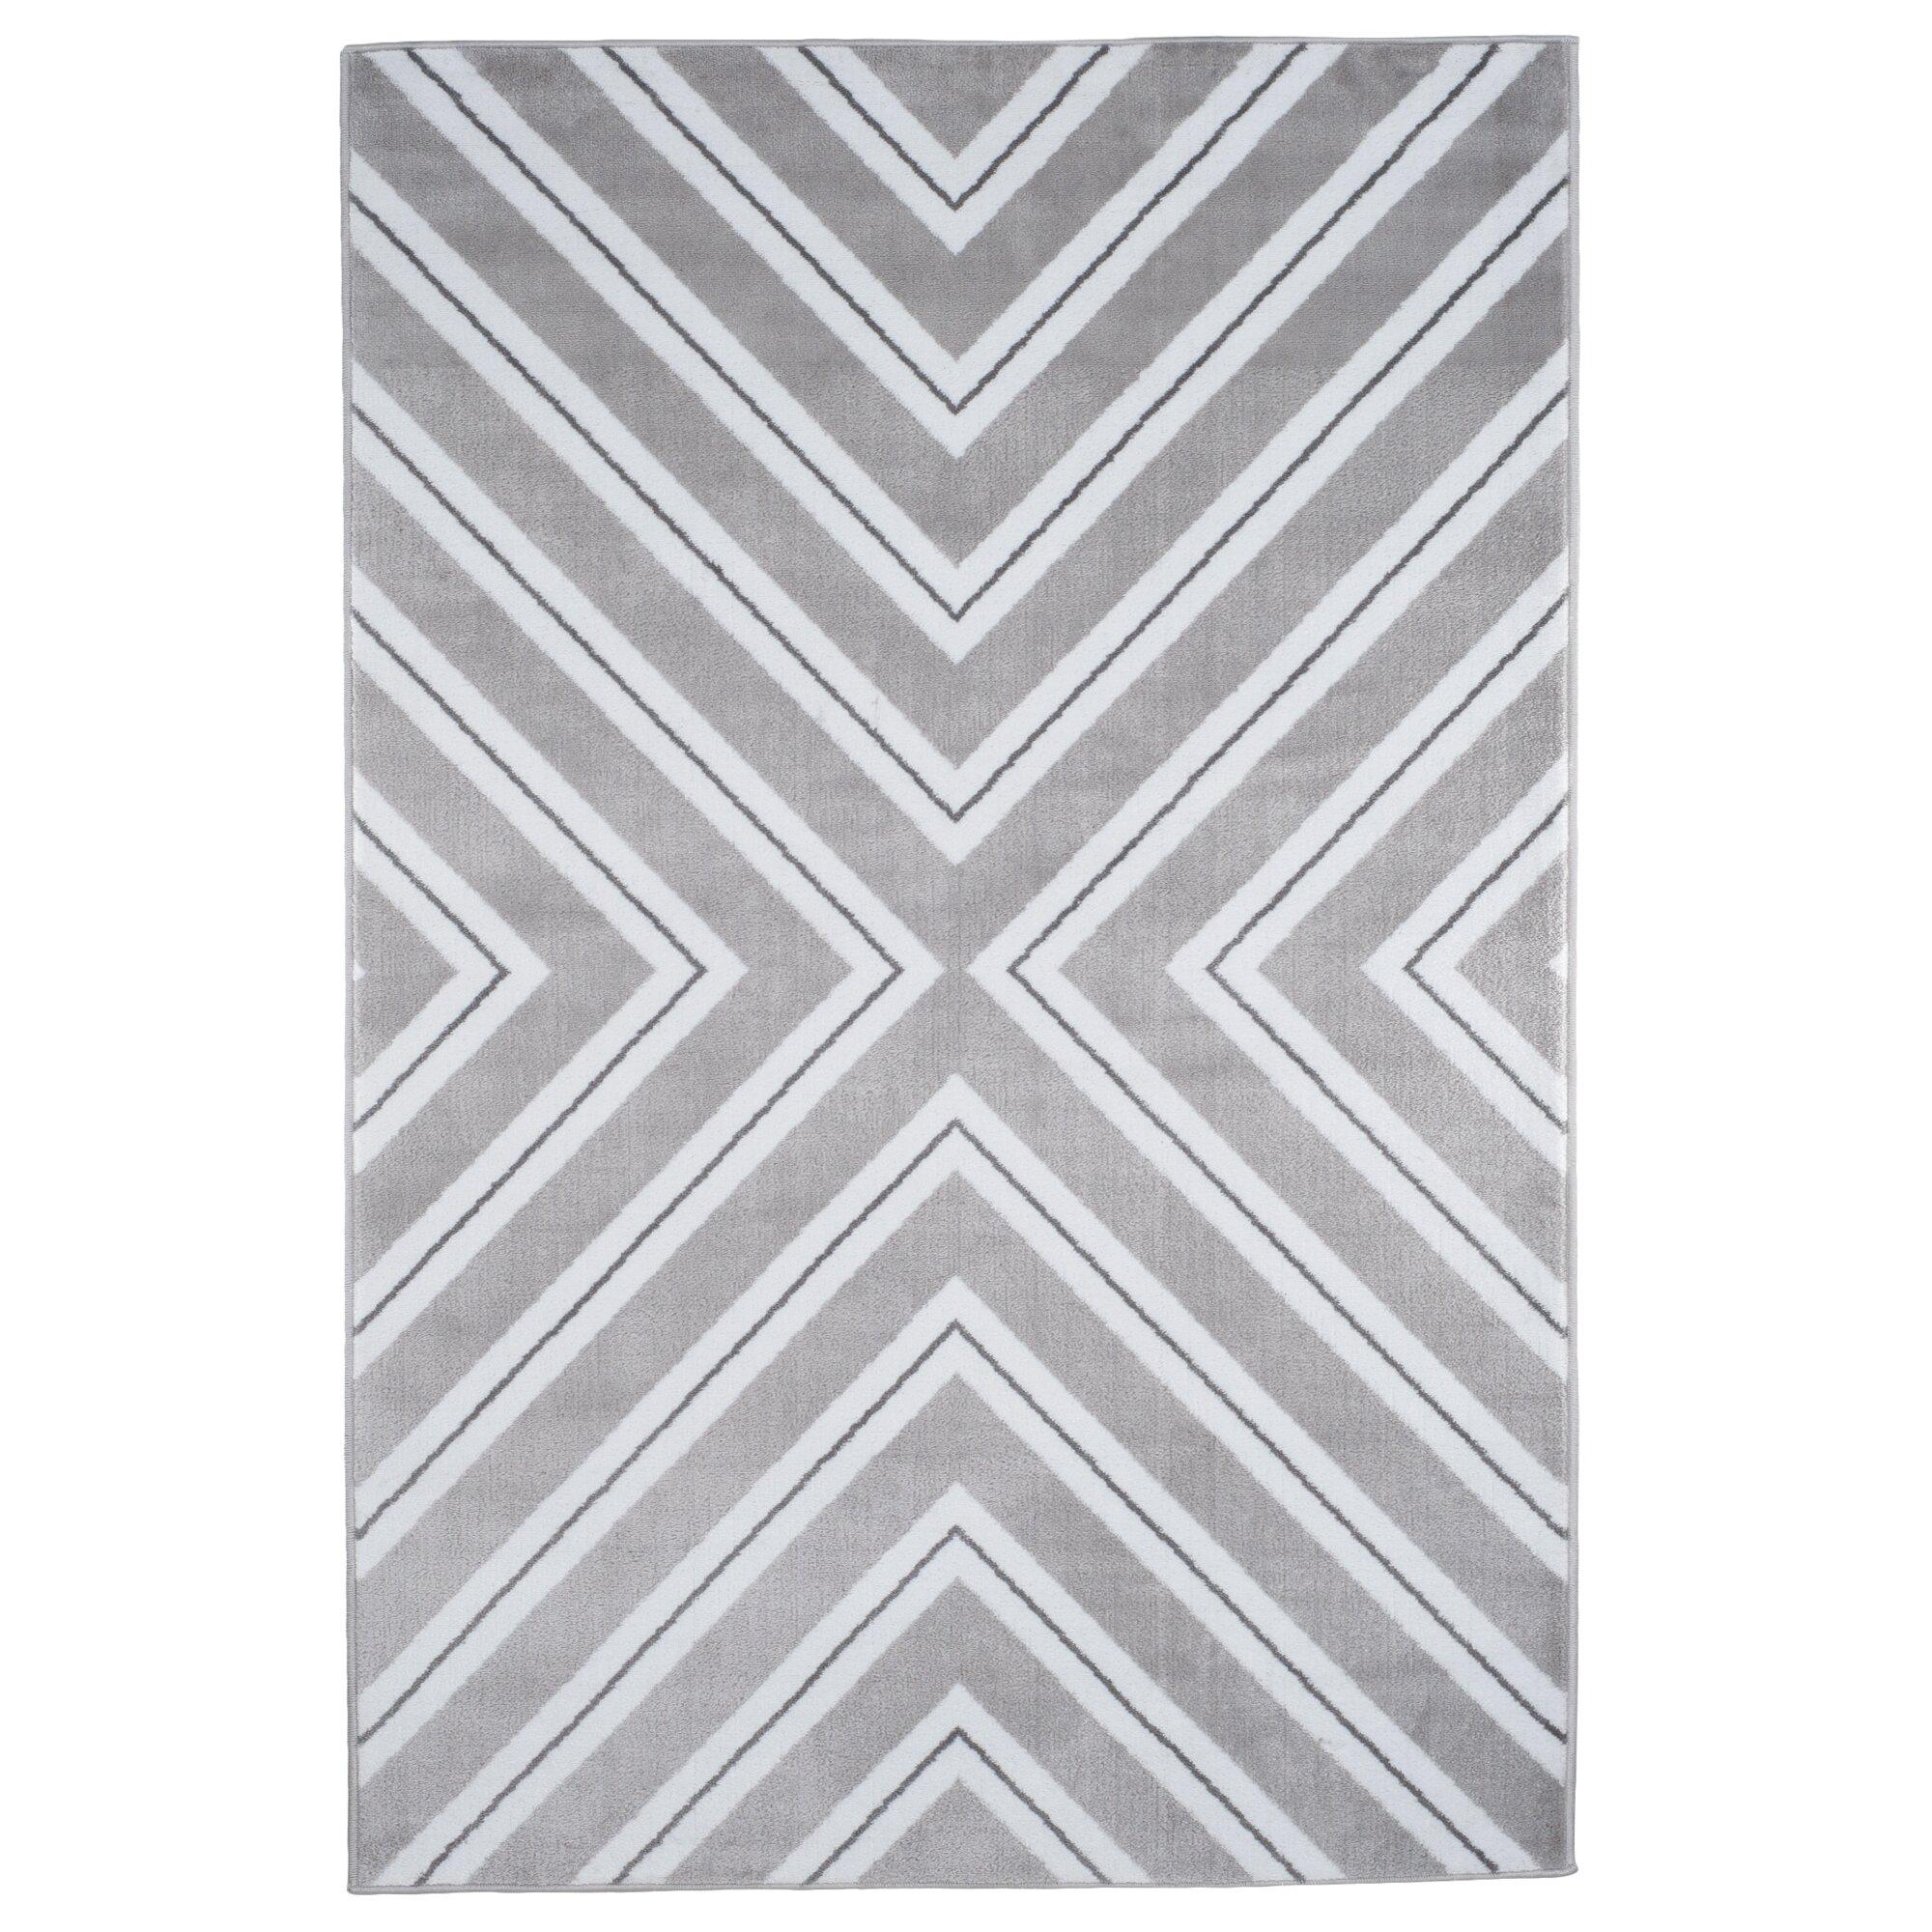 Rug Kaleidoscope Runner: Lavish Home Kaleidoscope Gray/White Area Rug & Reviews